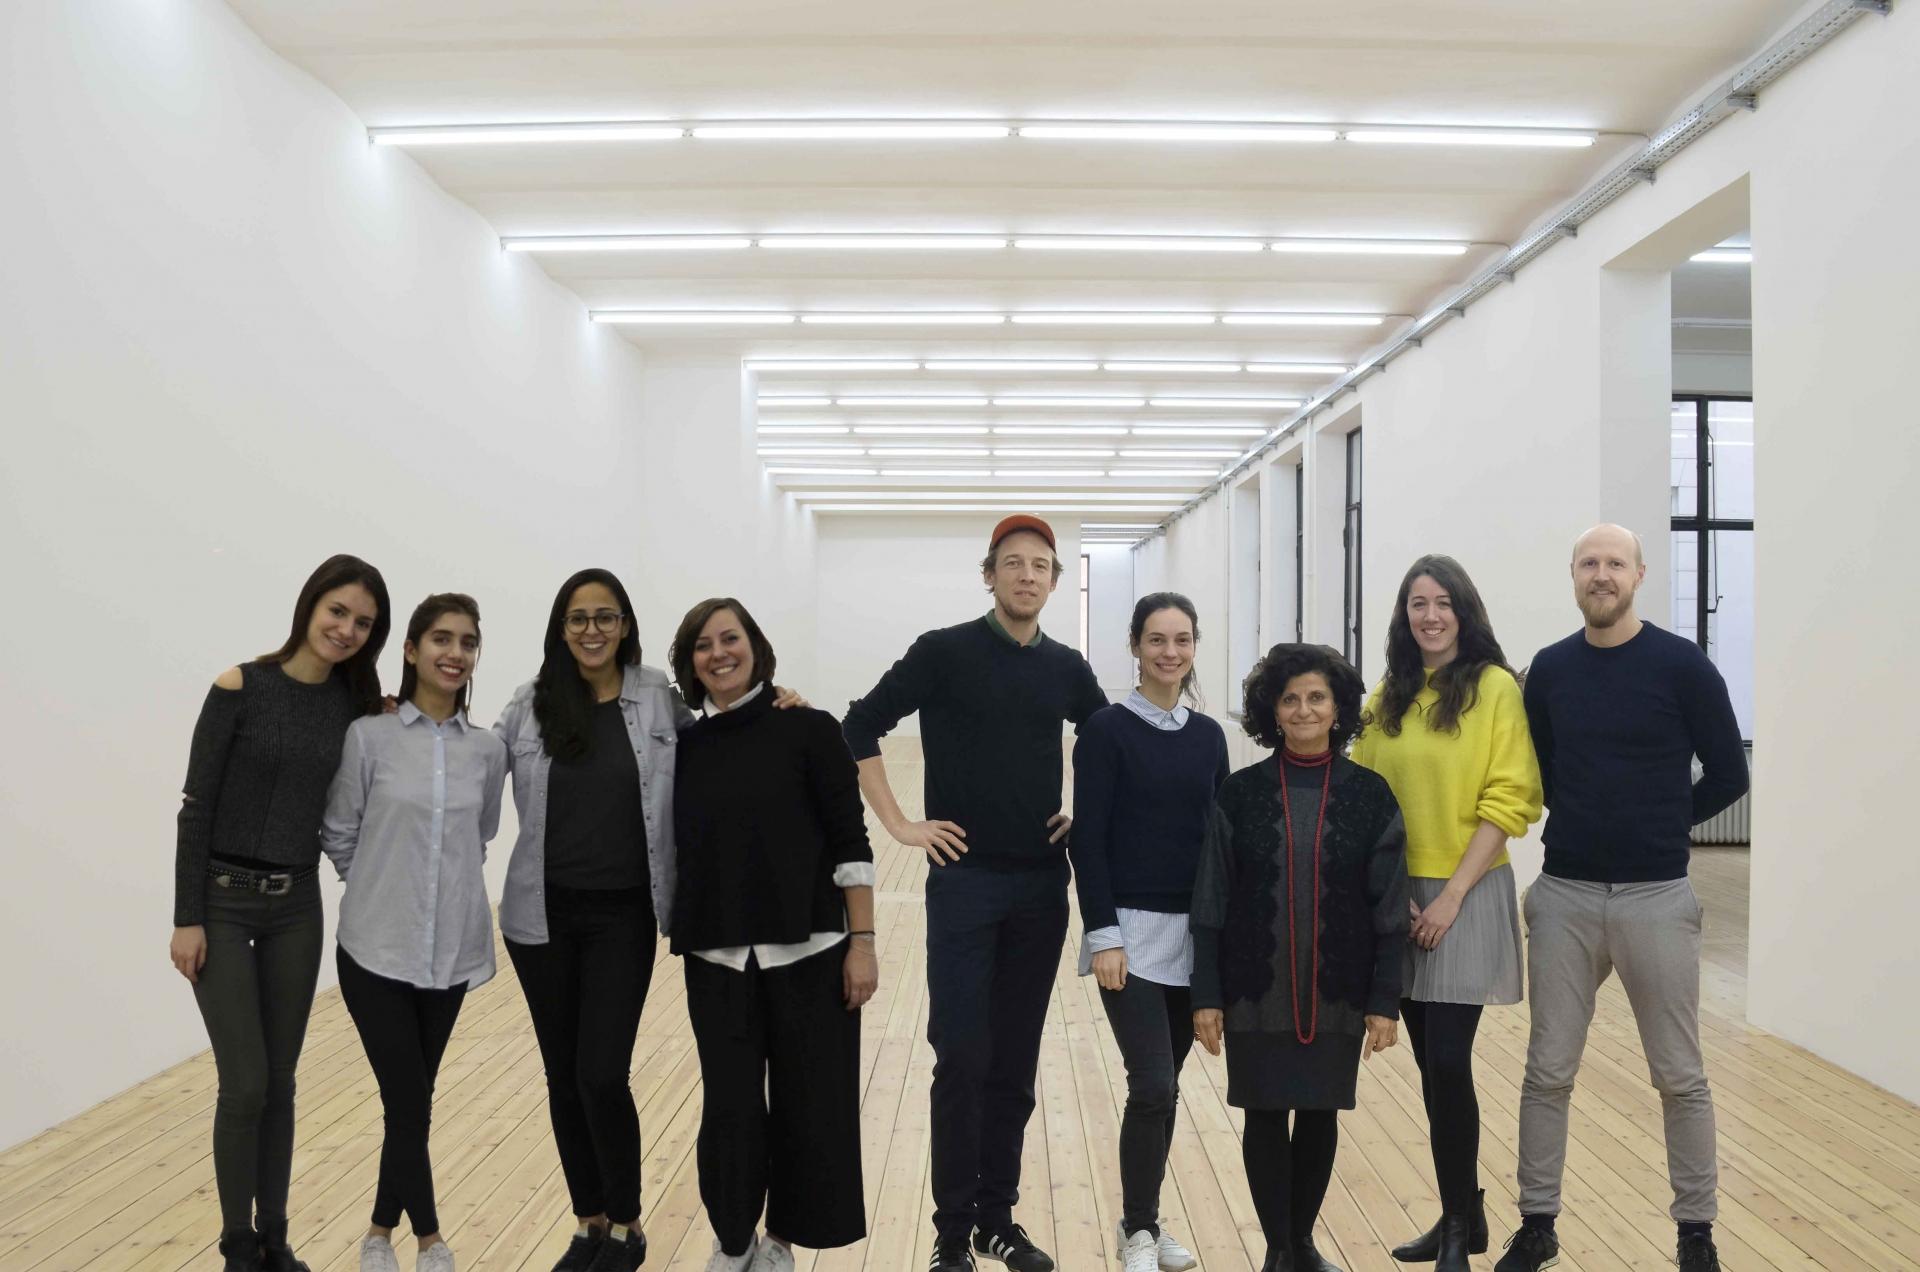 Sfeir Semler Gallery Team